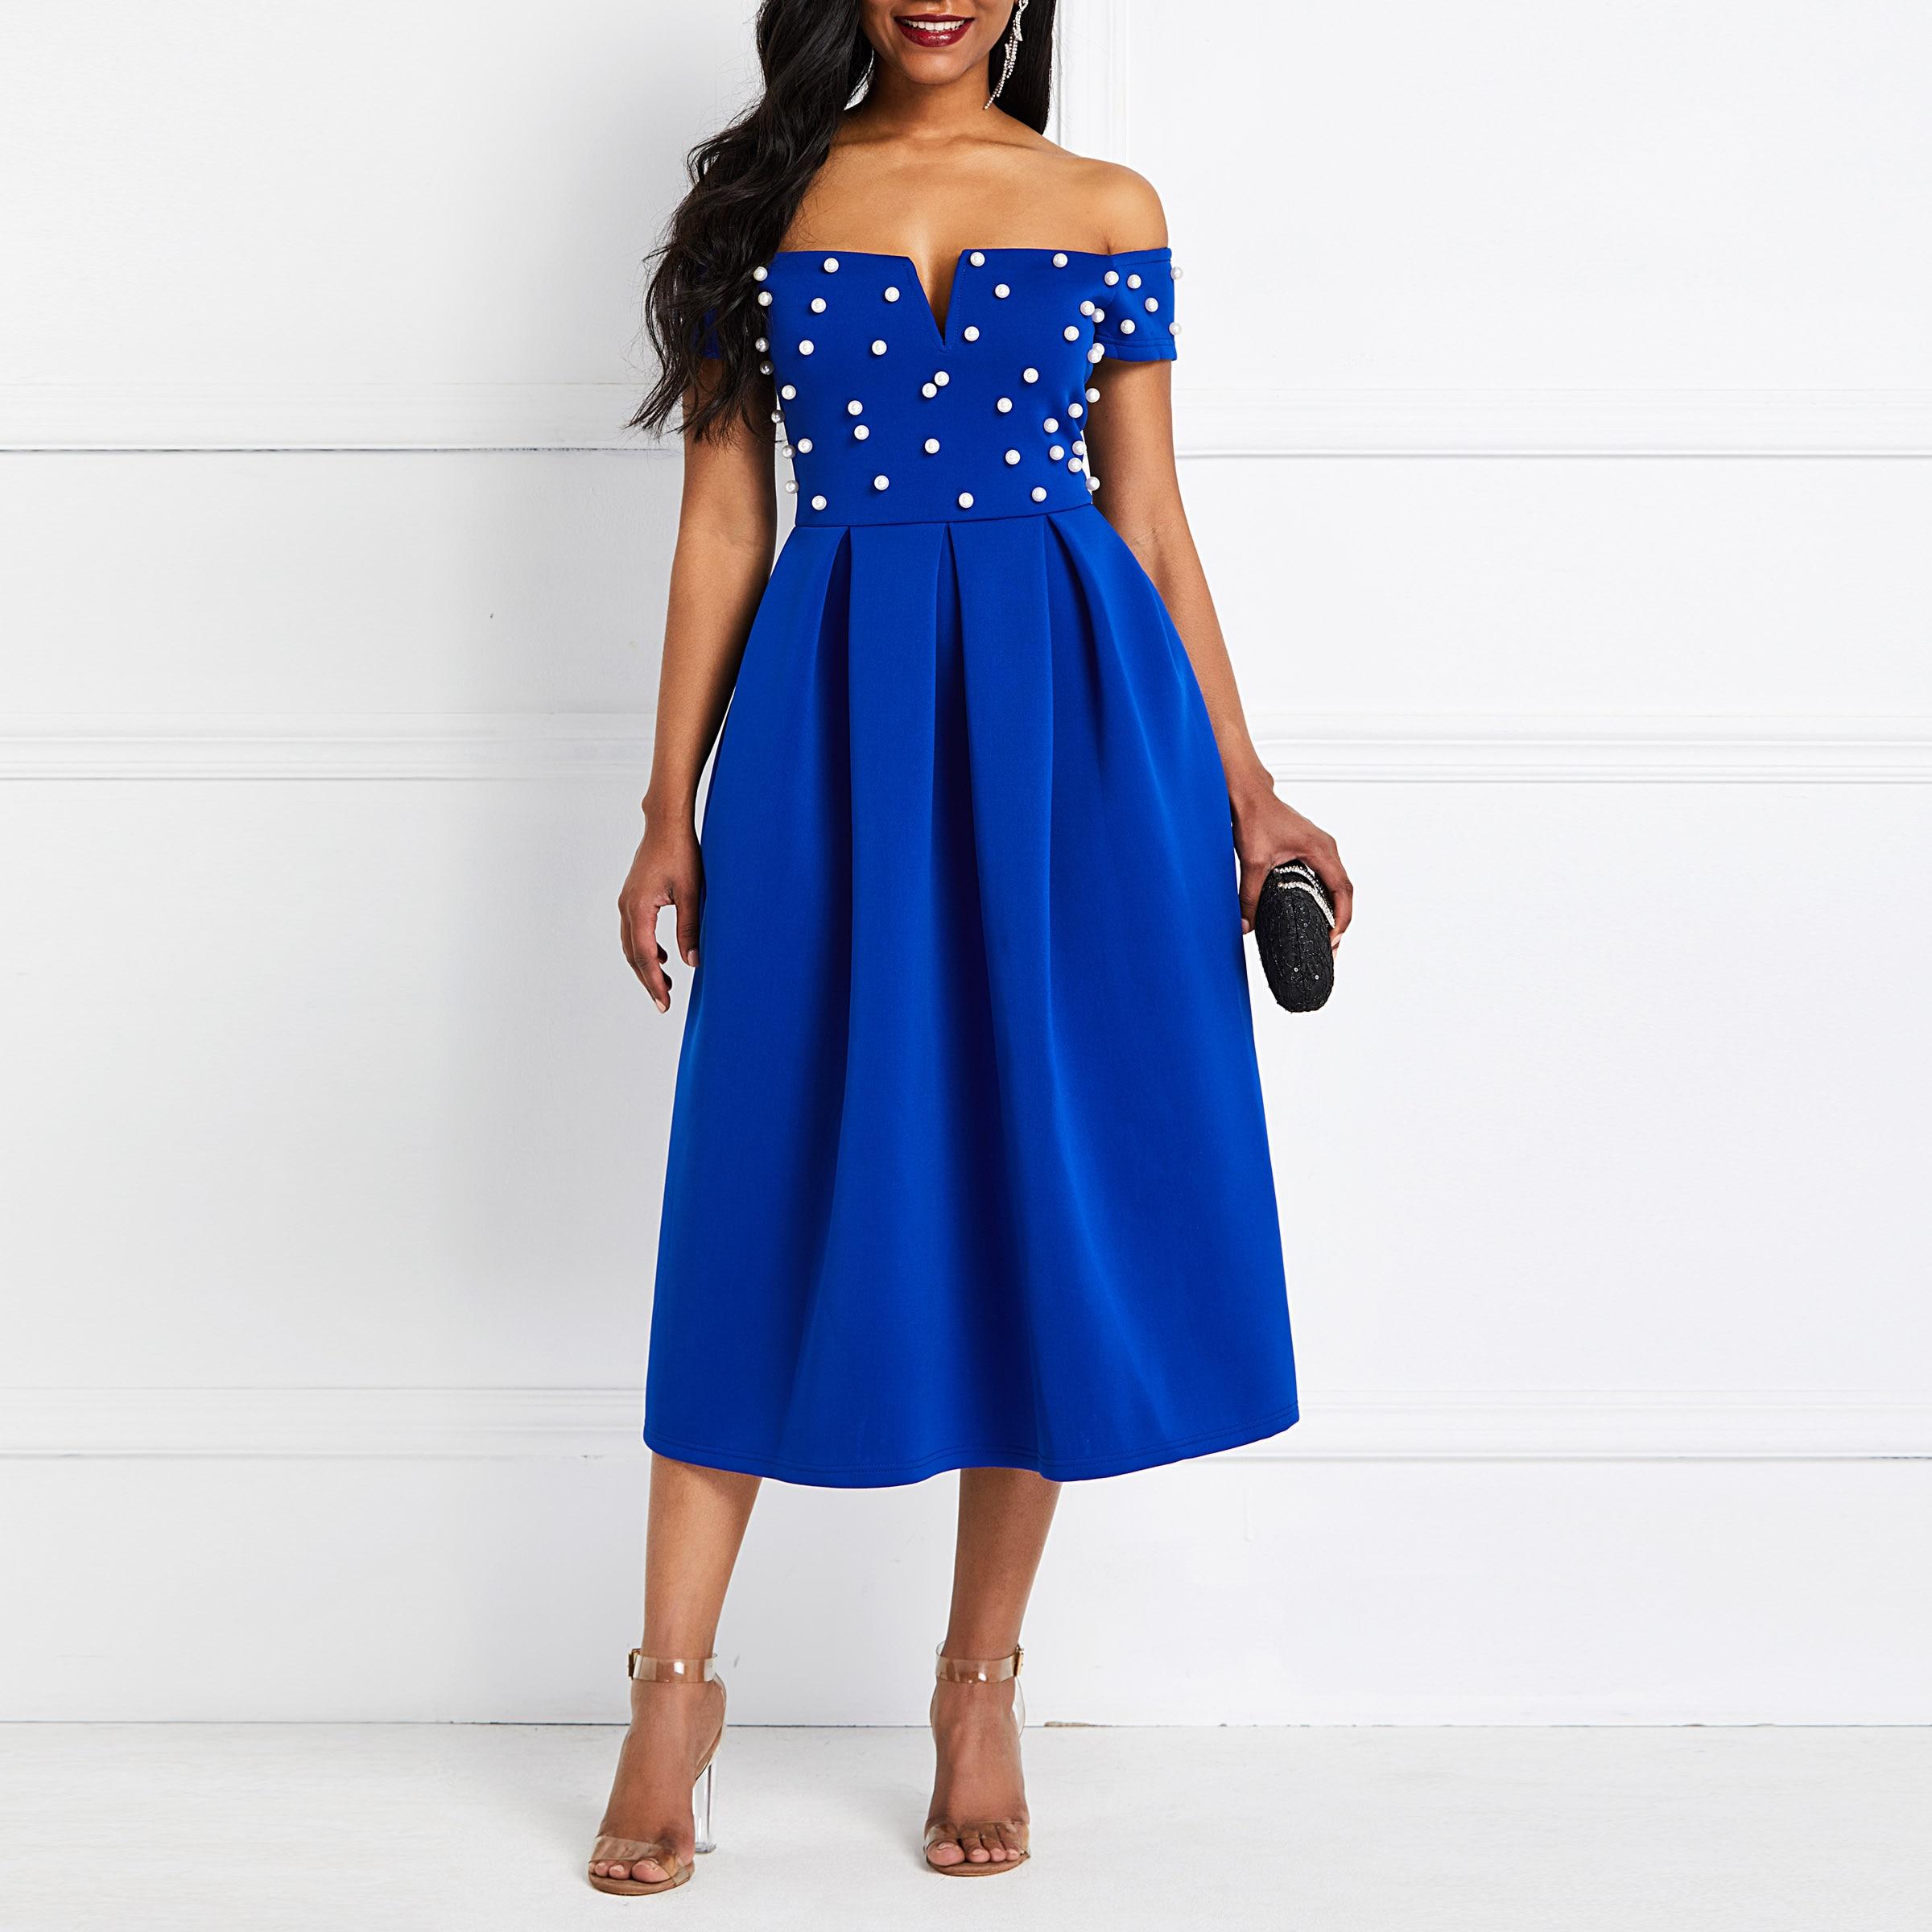 Sexy Off Shoulder Blue Elegant Evening Party Dress Women Beading Plus Size 4XL Club Midi Vestido Female African Fashion Autumn